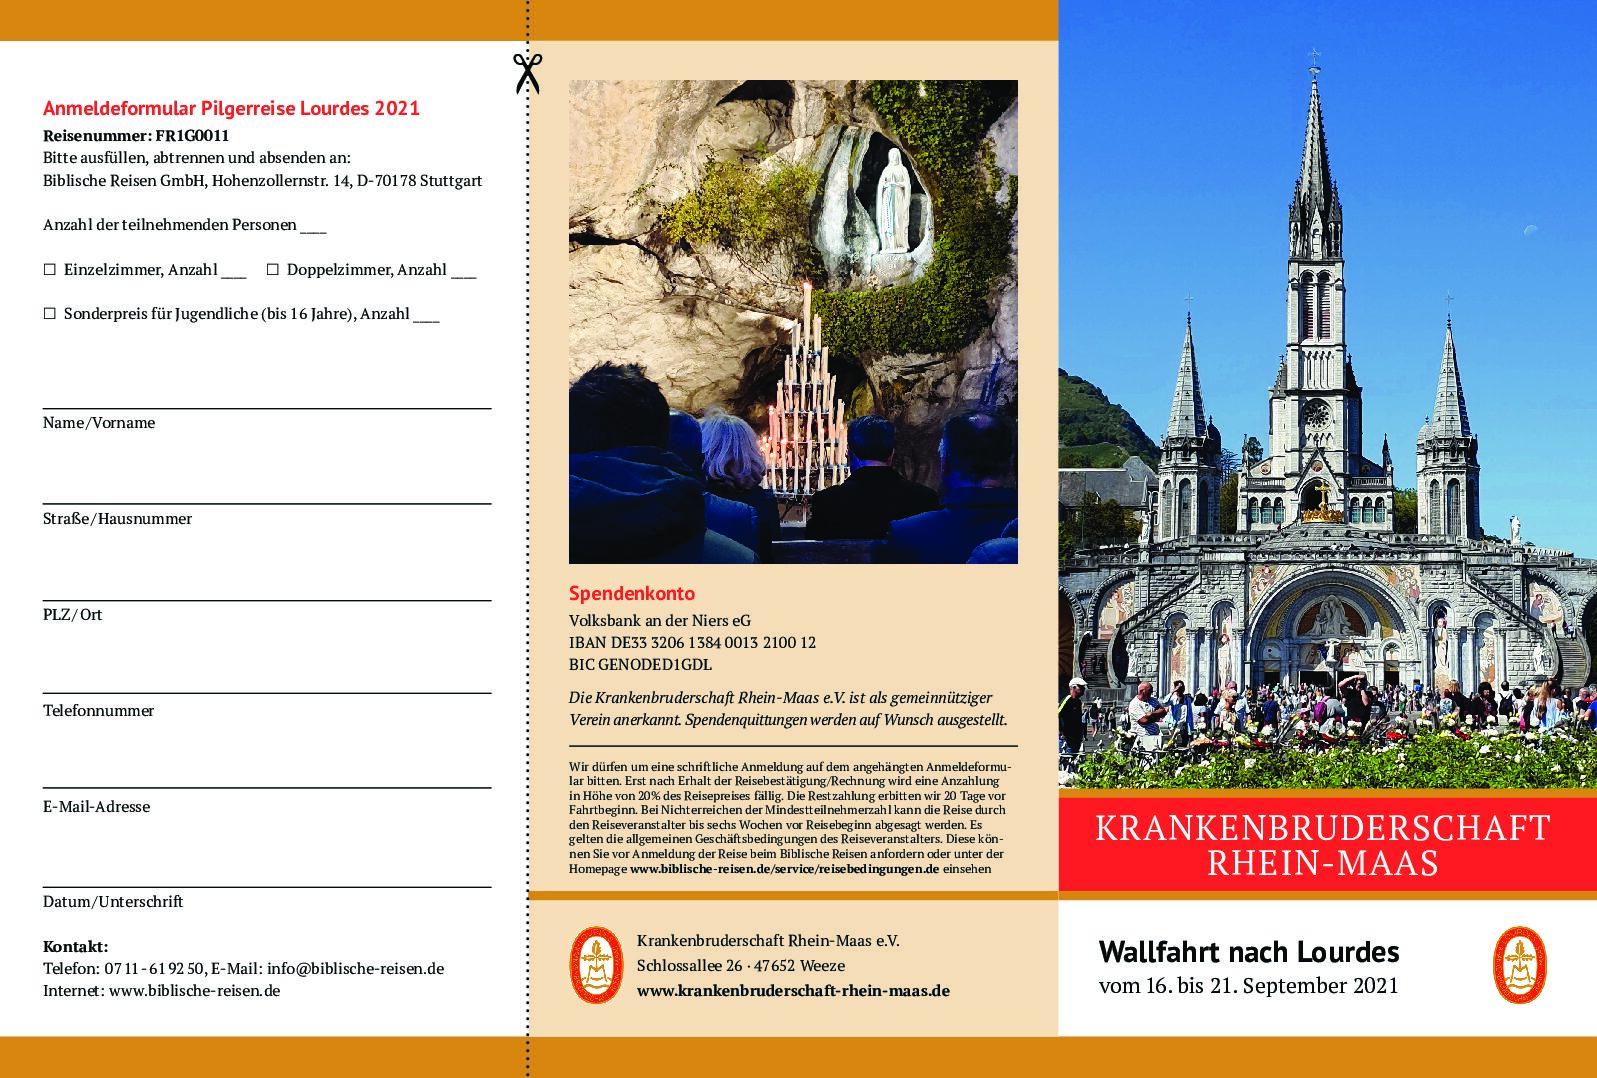 Lourdes-Wallfahrt im September 2021